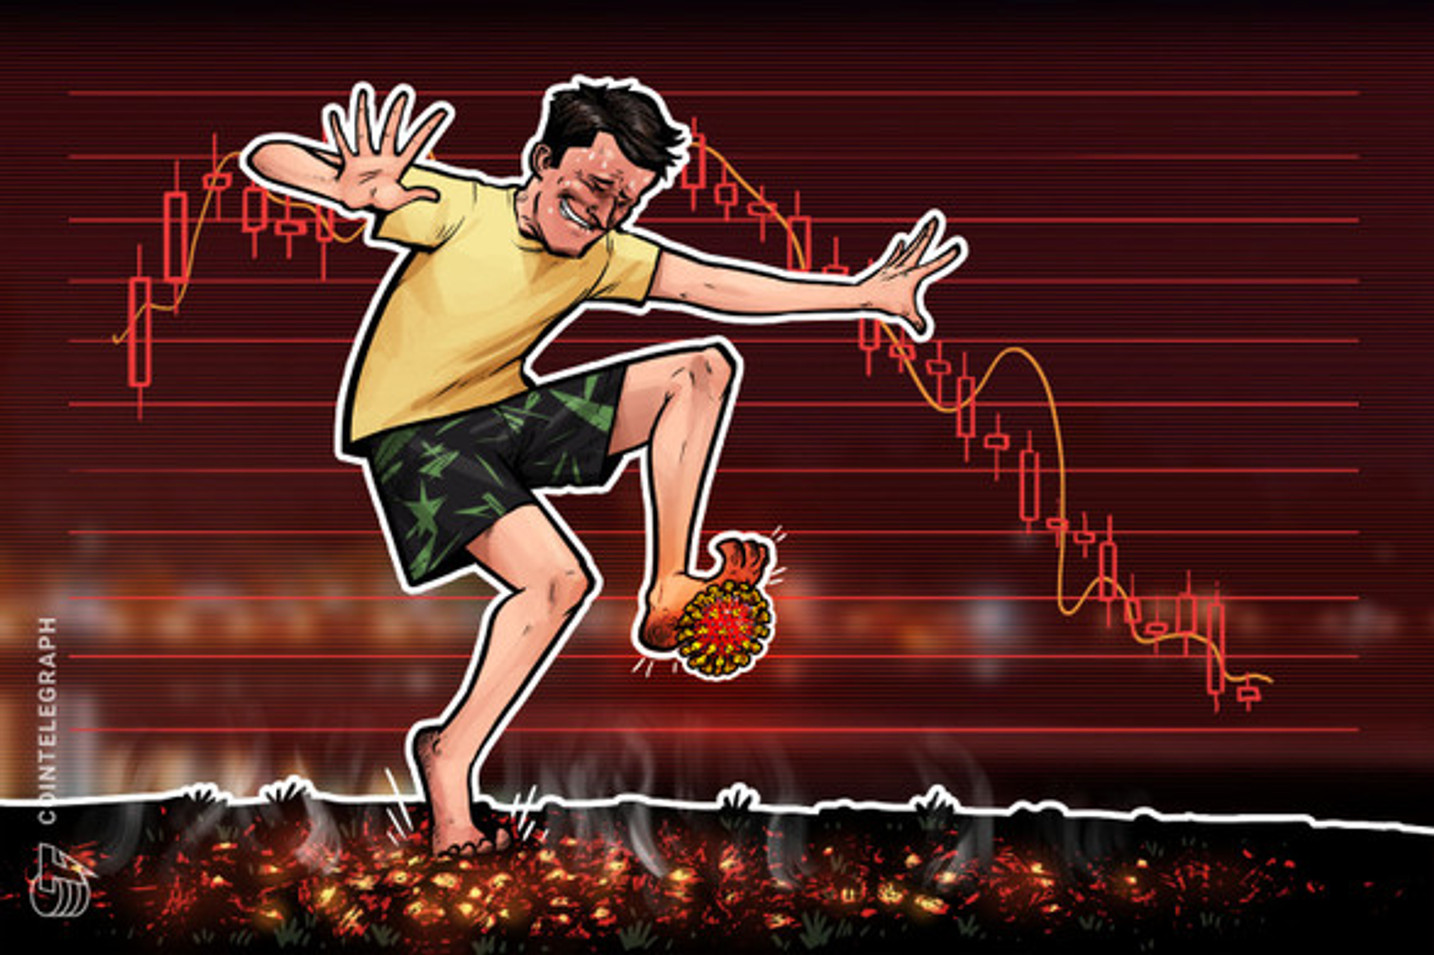 Medo de segunda onda de coronavírus derruba bolsas de valores ao redor do mundo; Bitcoin falha nos US$ 10 mil